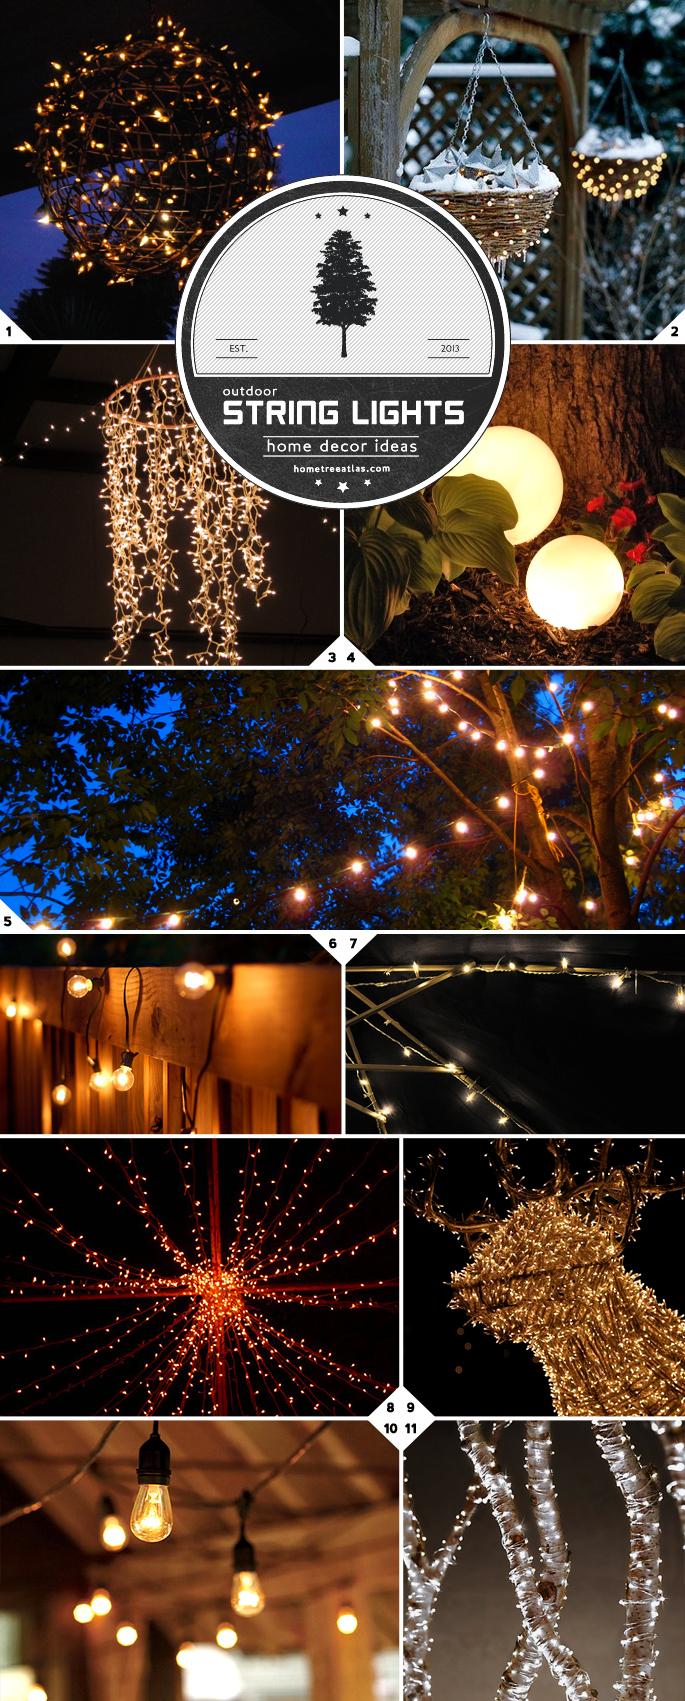 Home Decor Ideas: Creative Ways of Using String Lights ... on Backyard String Light Designs id=51057